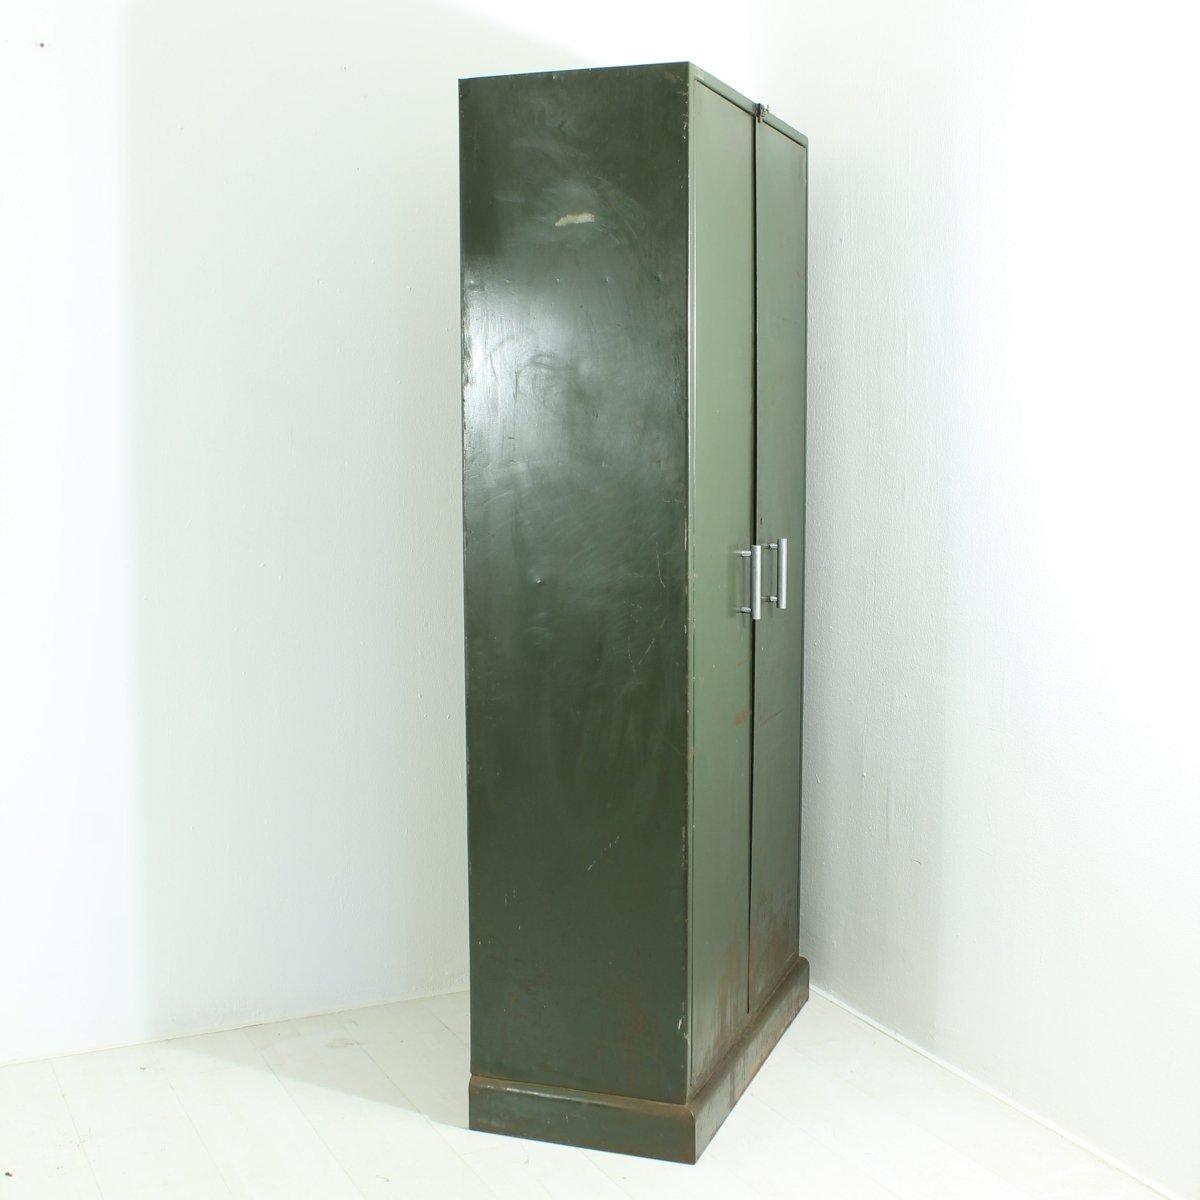 dunkelgr ner industrie schrank aus metall 1930er bei pamono kaufen. Black Bedroom Furniture Sets. Home Design Ideas